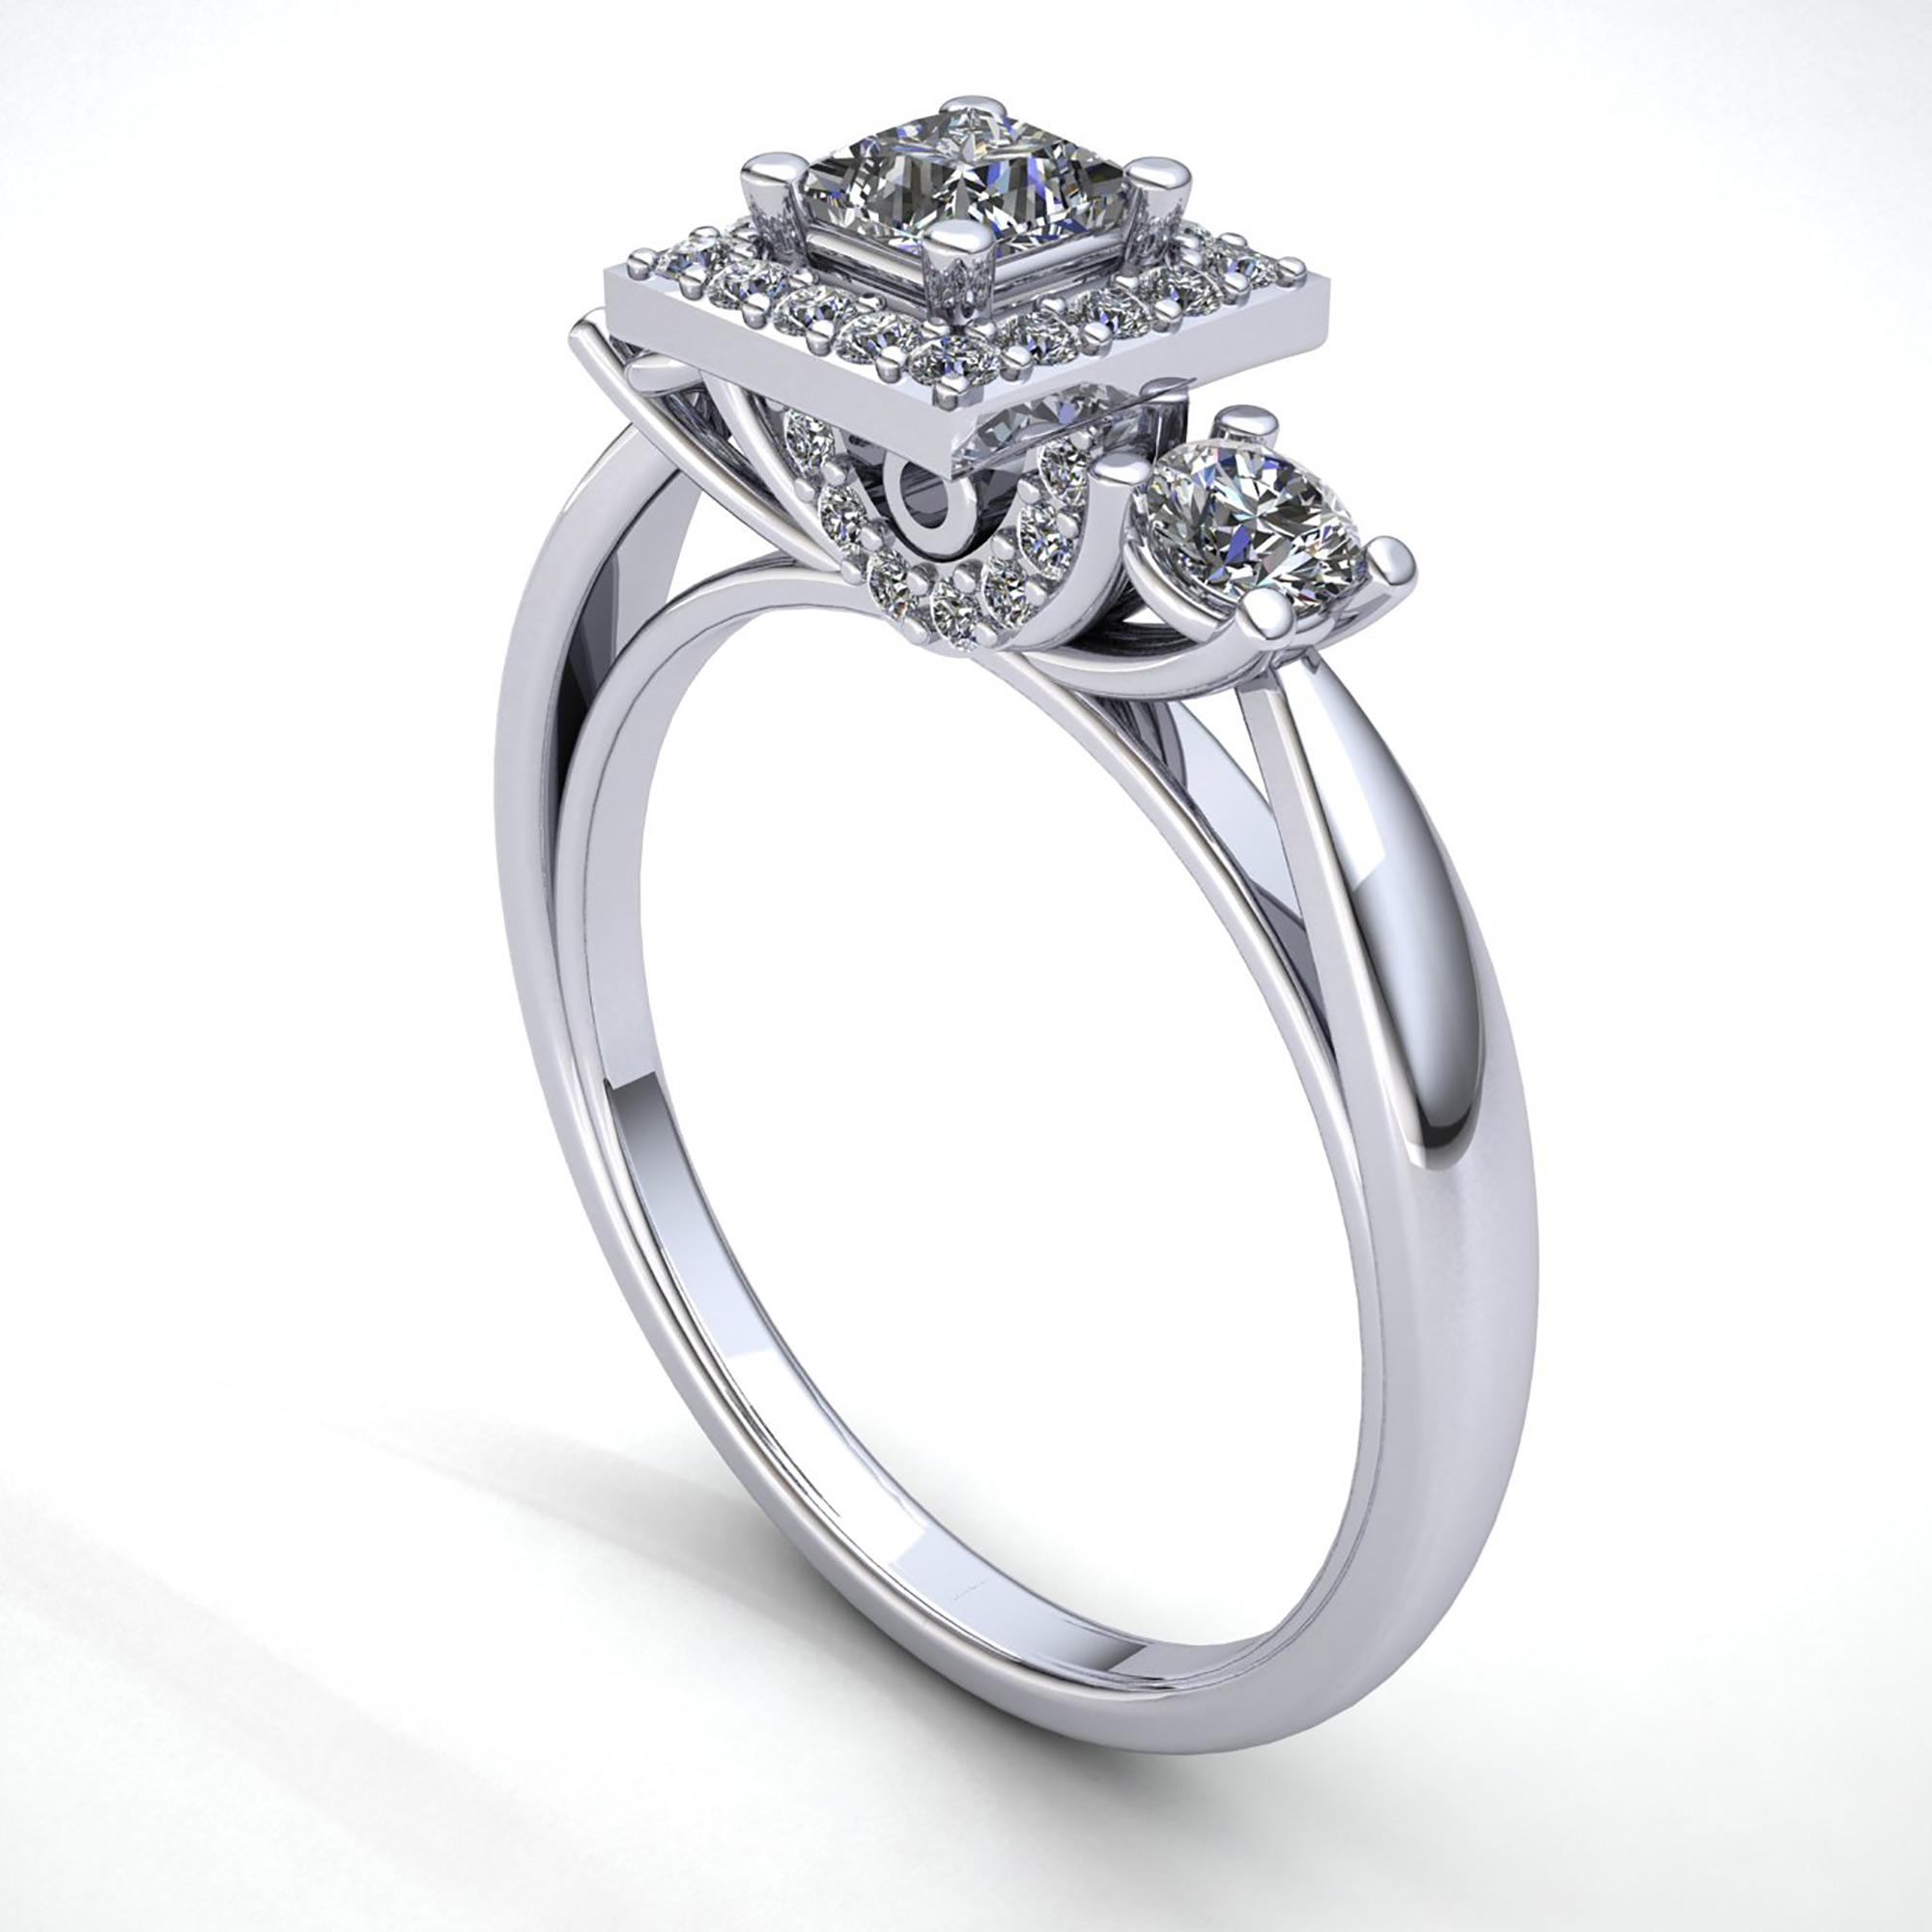 3738a895d48e 0.5carat Diamante Talla Princesa Mujer Cuadrado Halo 3stone Anillo ...